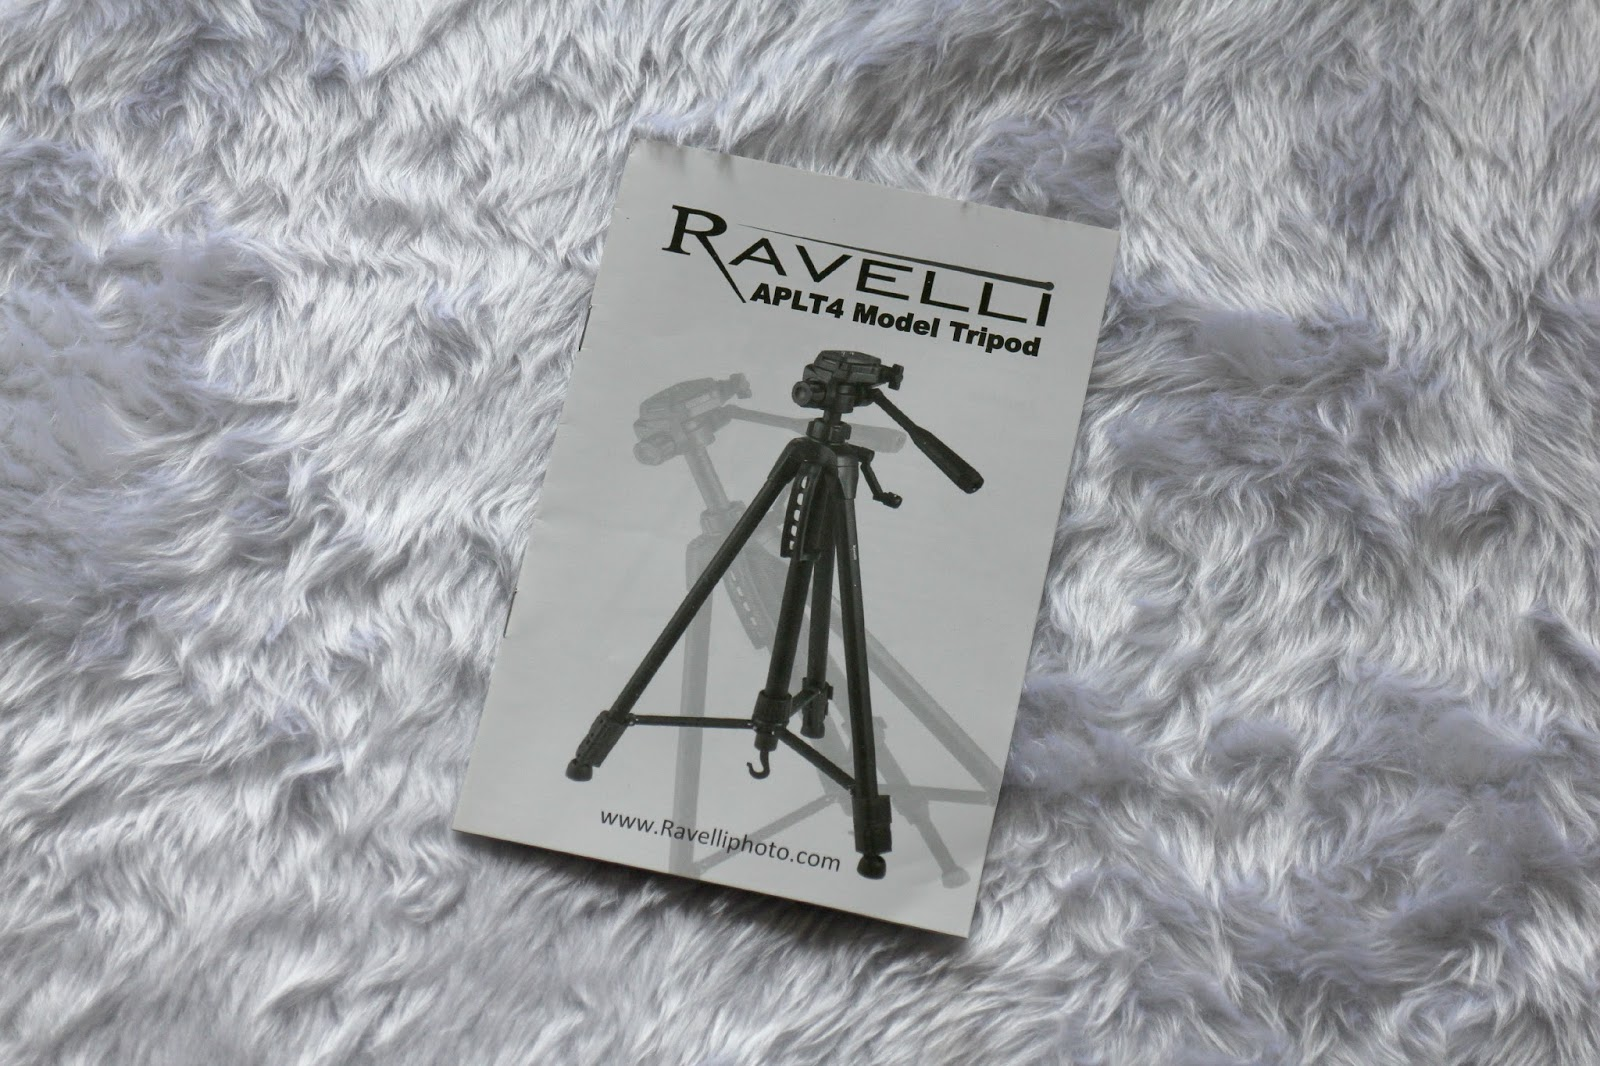 Ravelli APLT4 Tripod Amazon